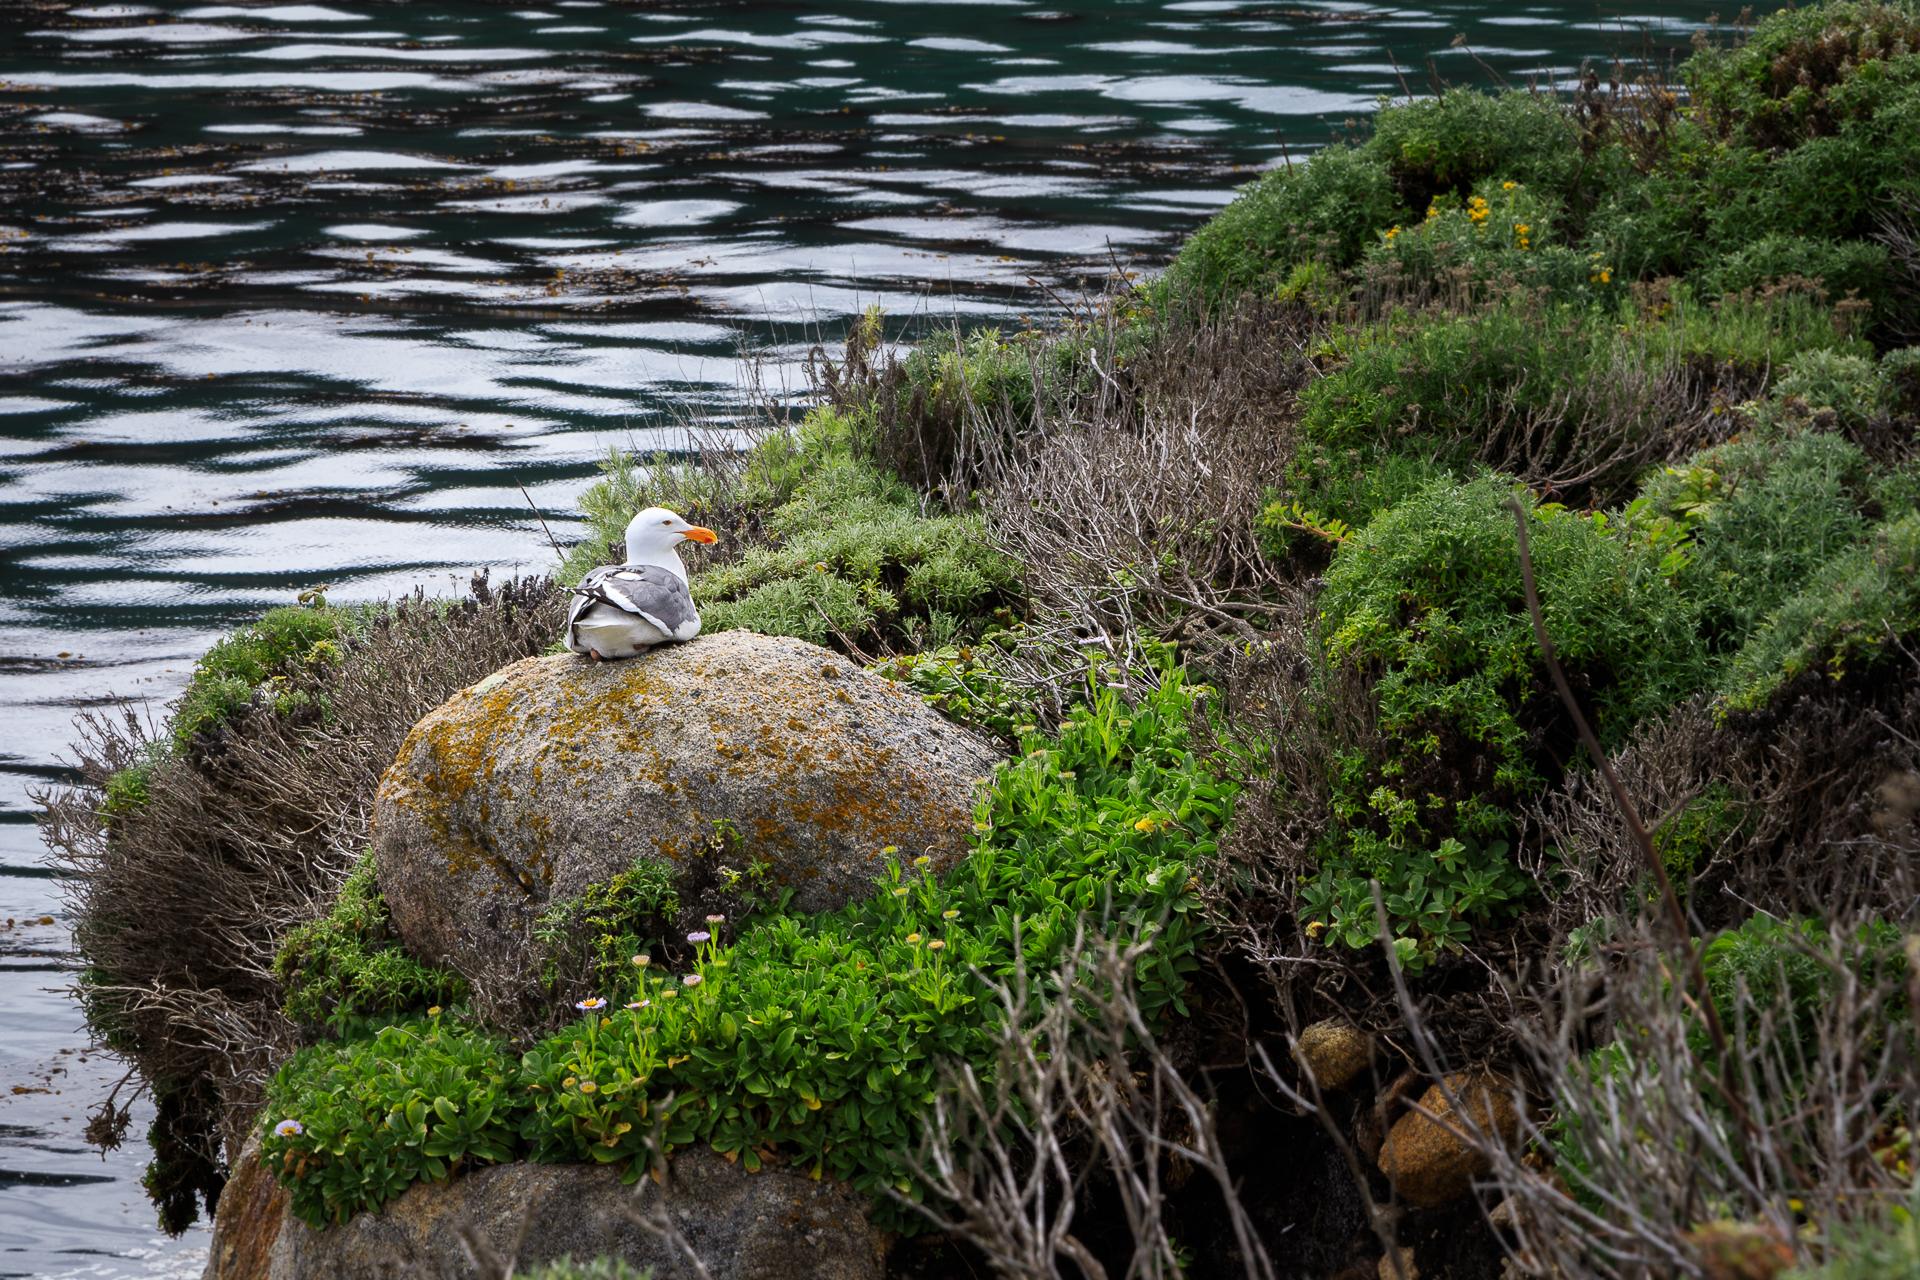 Seagull Resting on Rocks